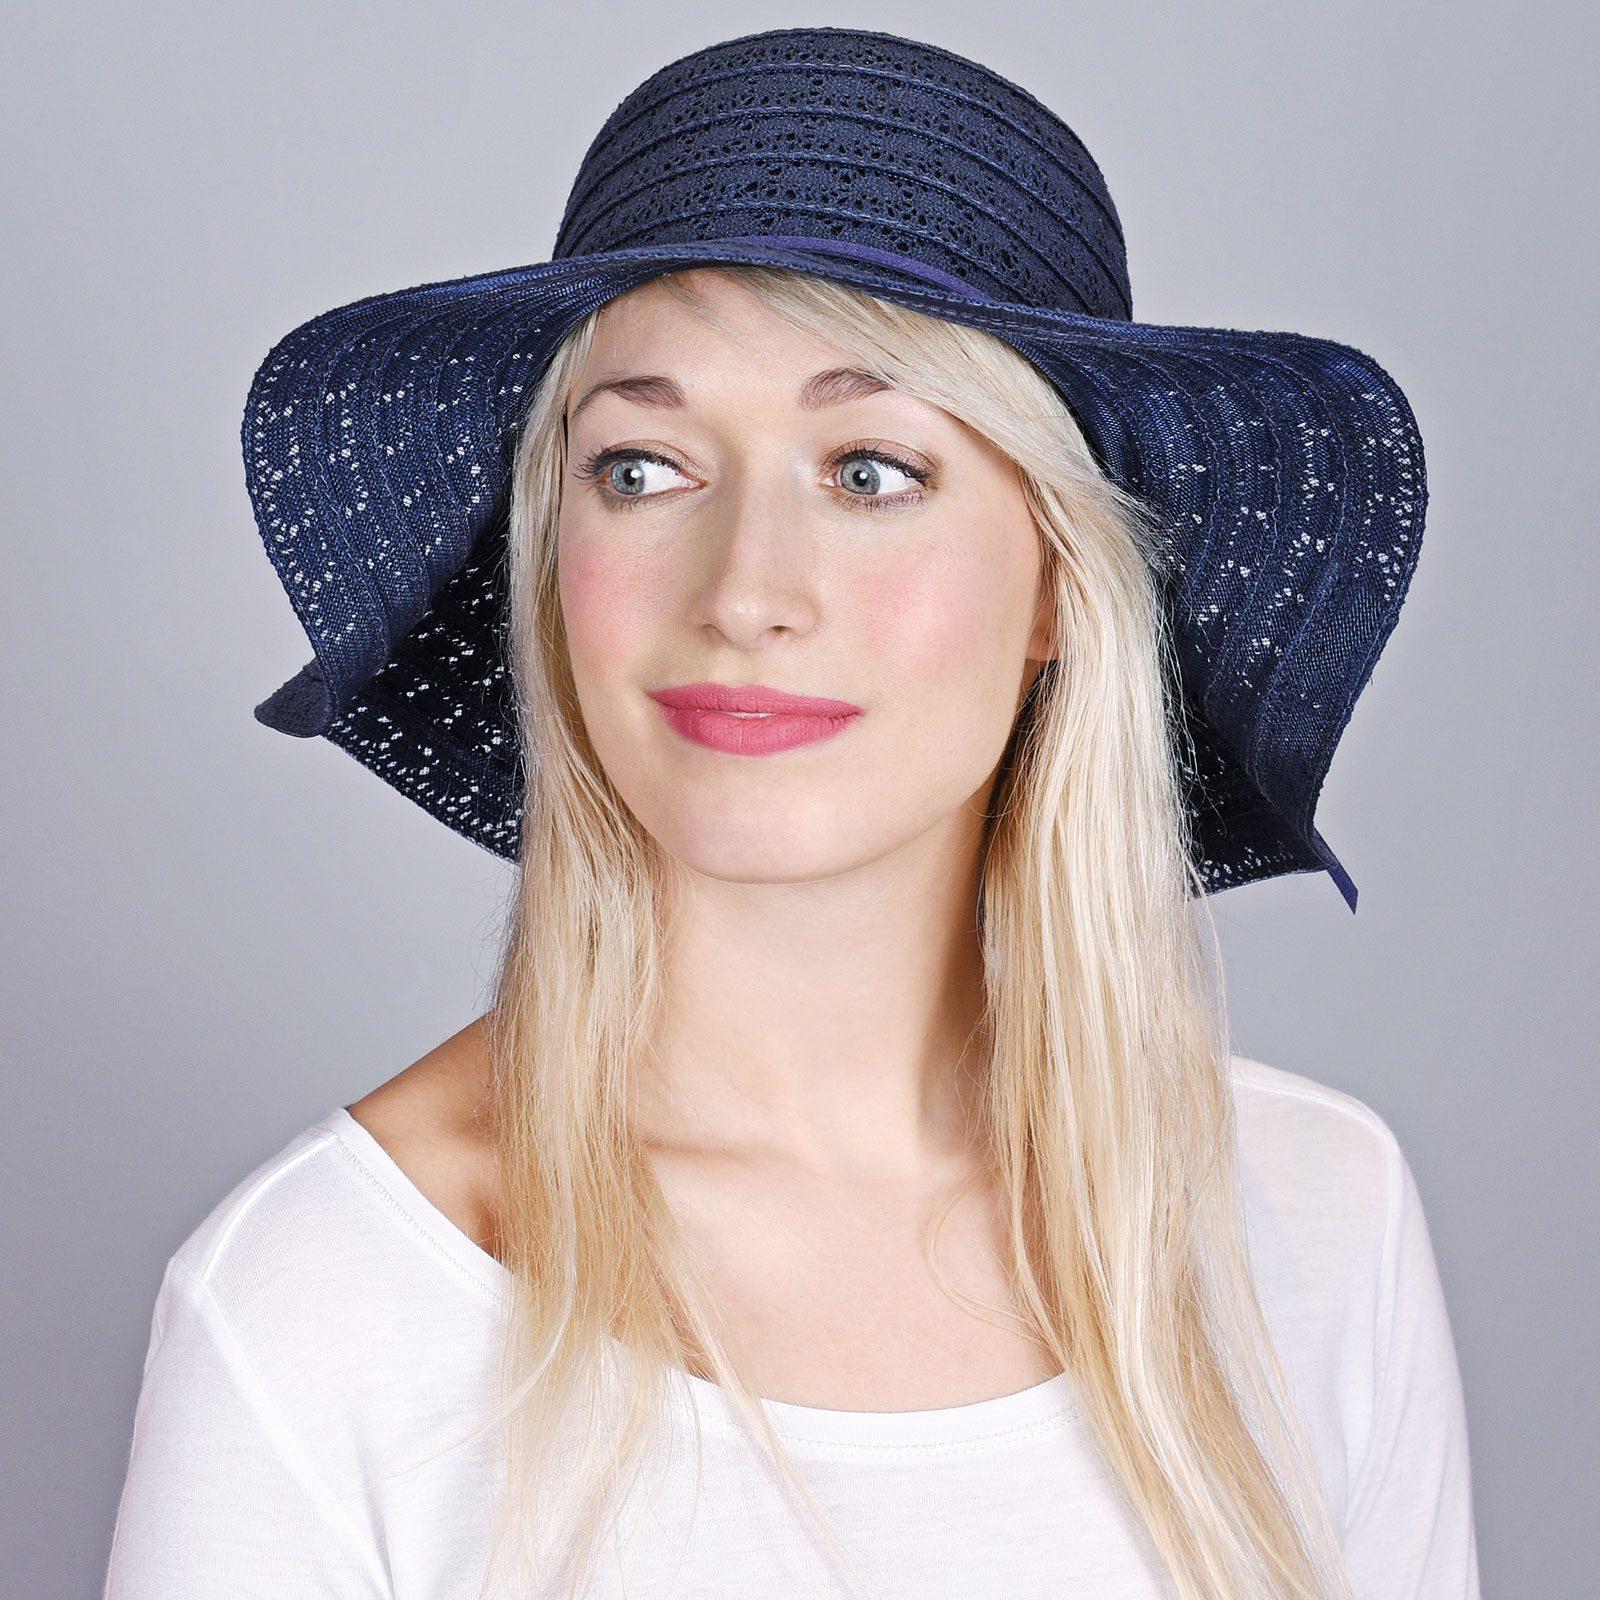 http://lookbook.allee-du-foulard.fr/wp-content/uploads/2018/06/CP-00893-VF16-1-chapeau-femme-bleu-marine-larges-bords-1600x1600.jpg